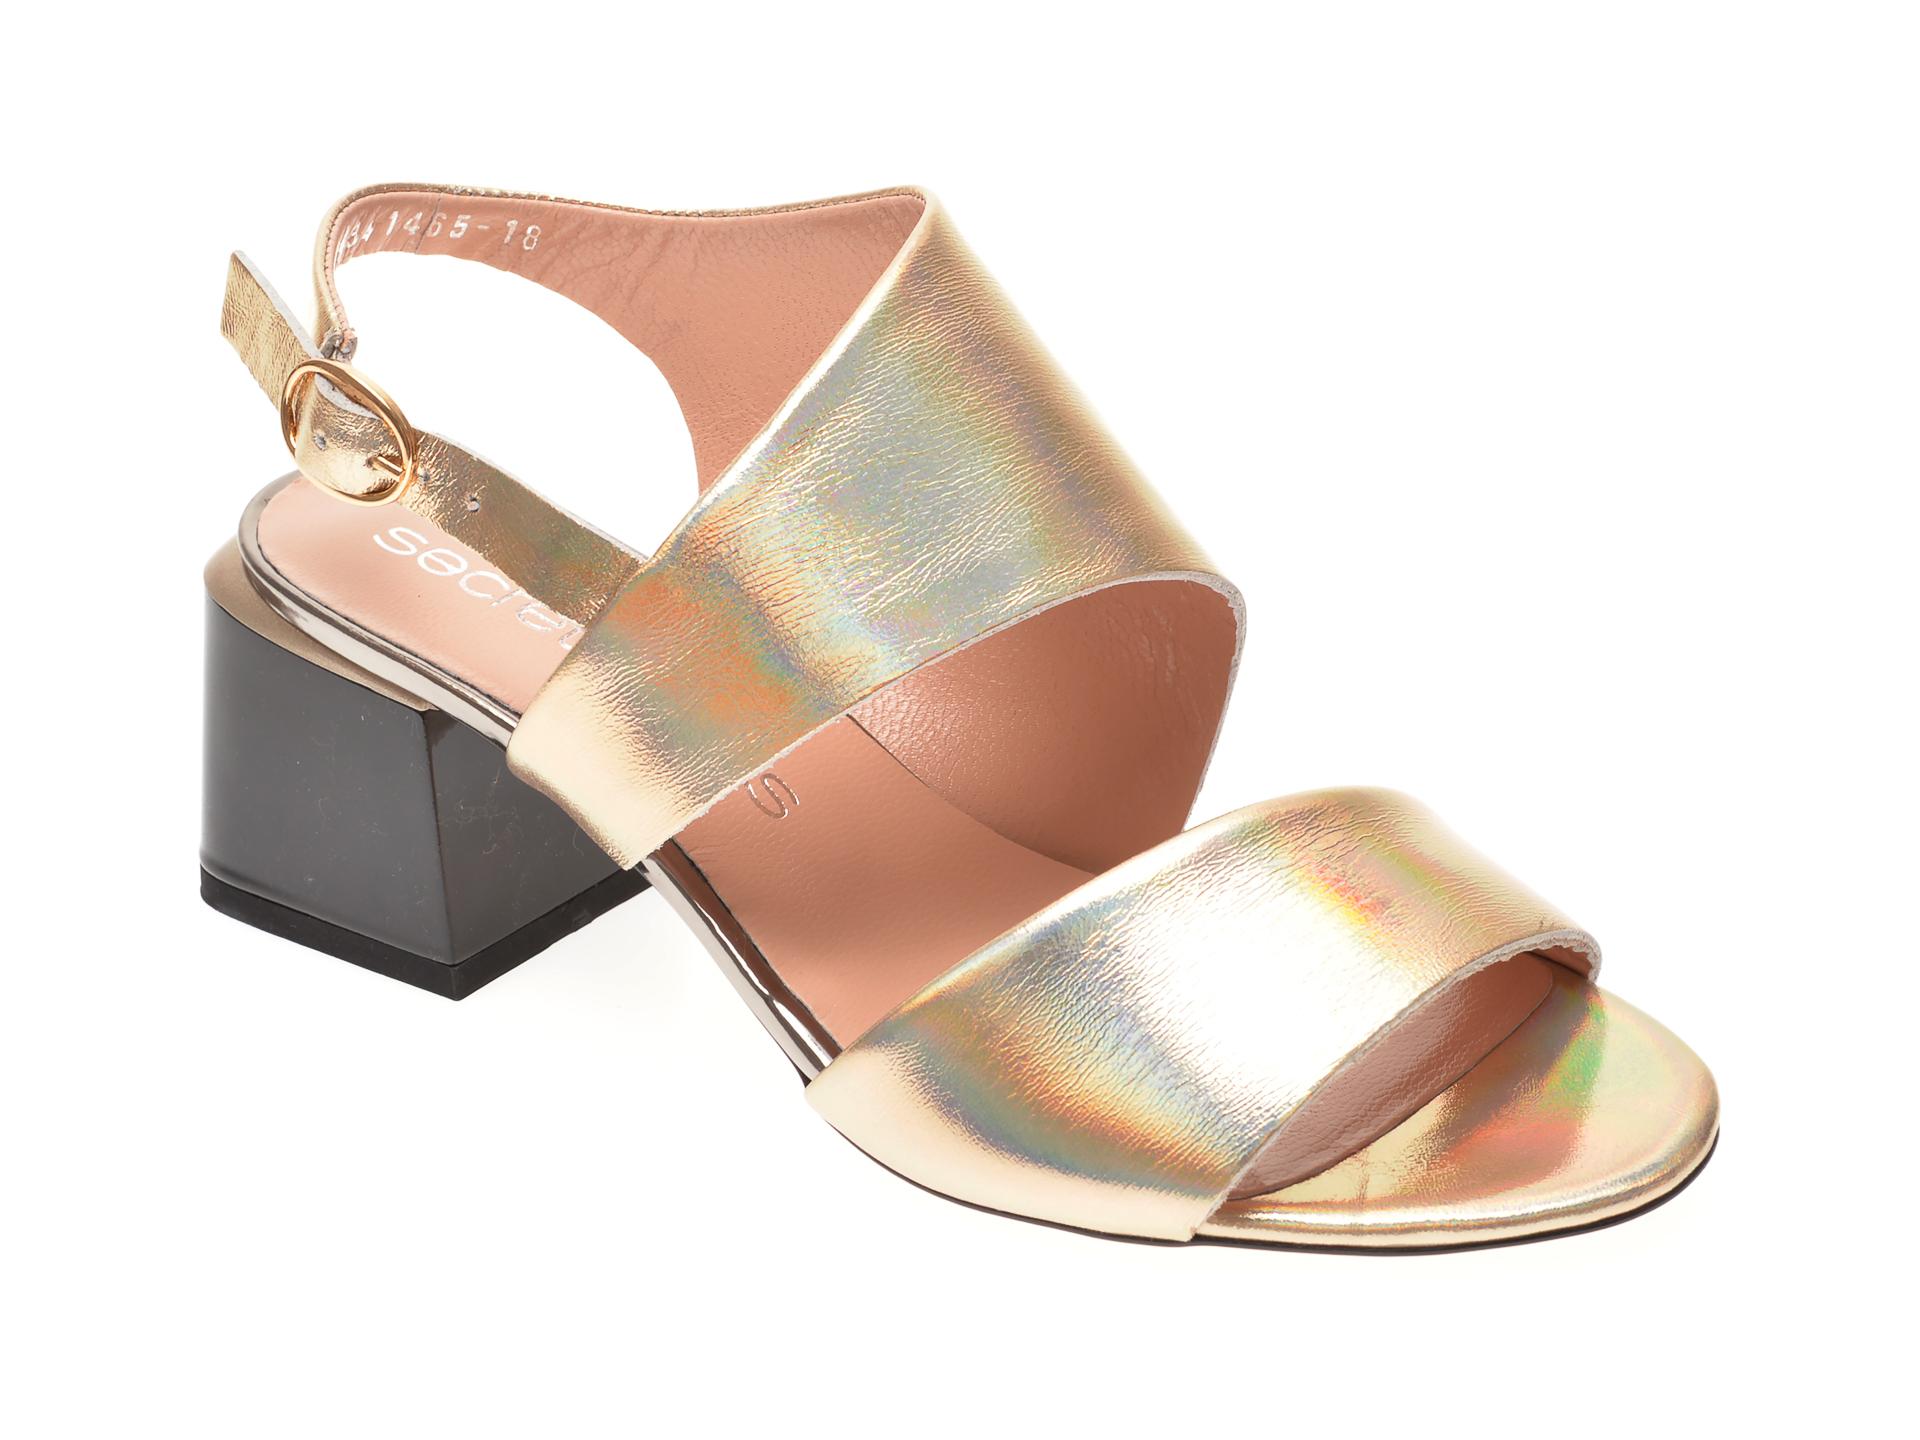 Sandale MISS LIZA aurii, 1182434, din piele naturala lacuita imagine